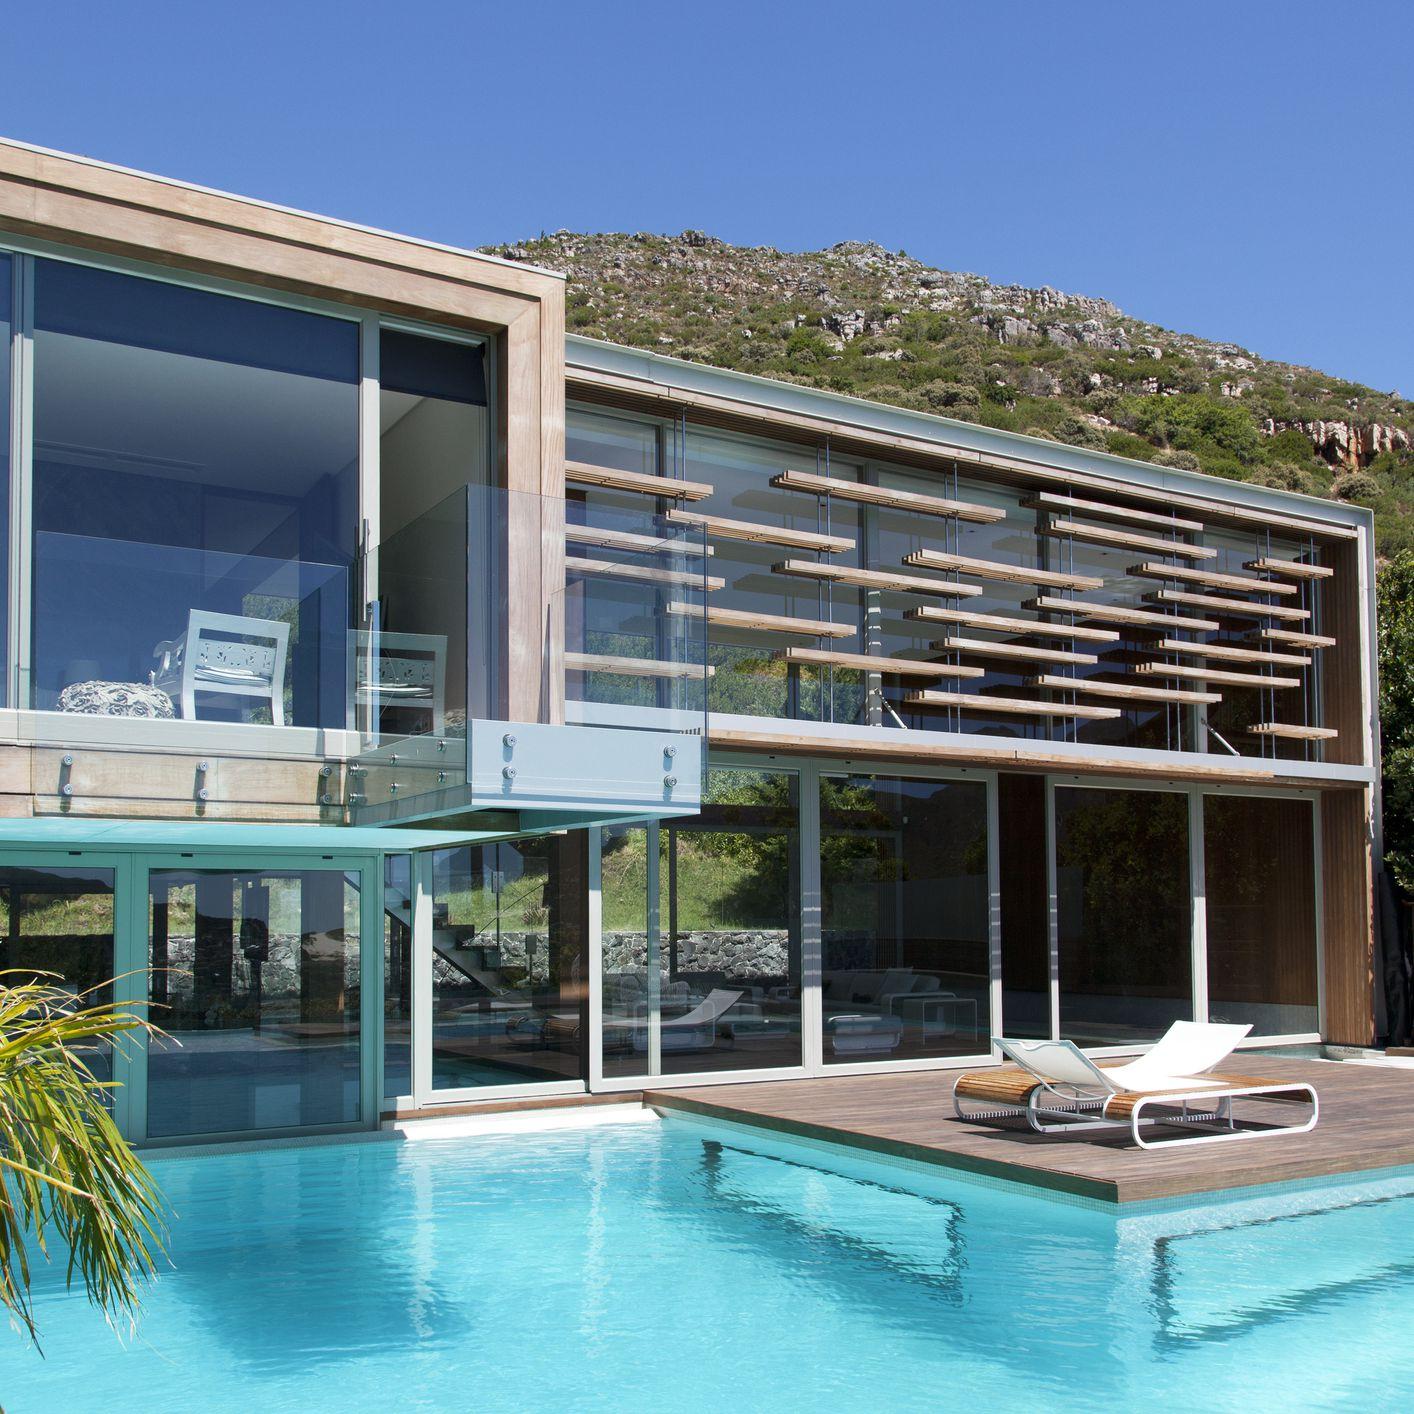 25 Beautiful Modern Swimming Pool Designs